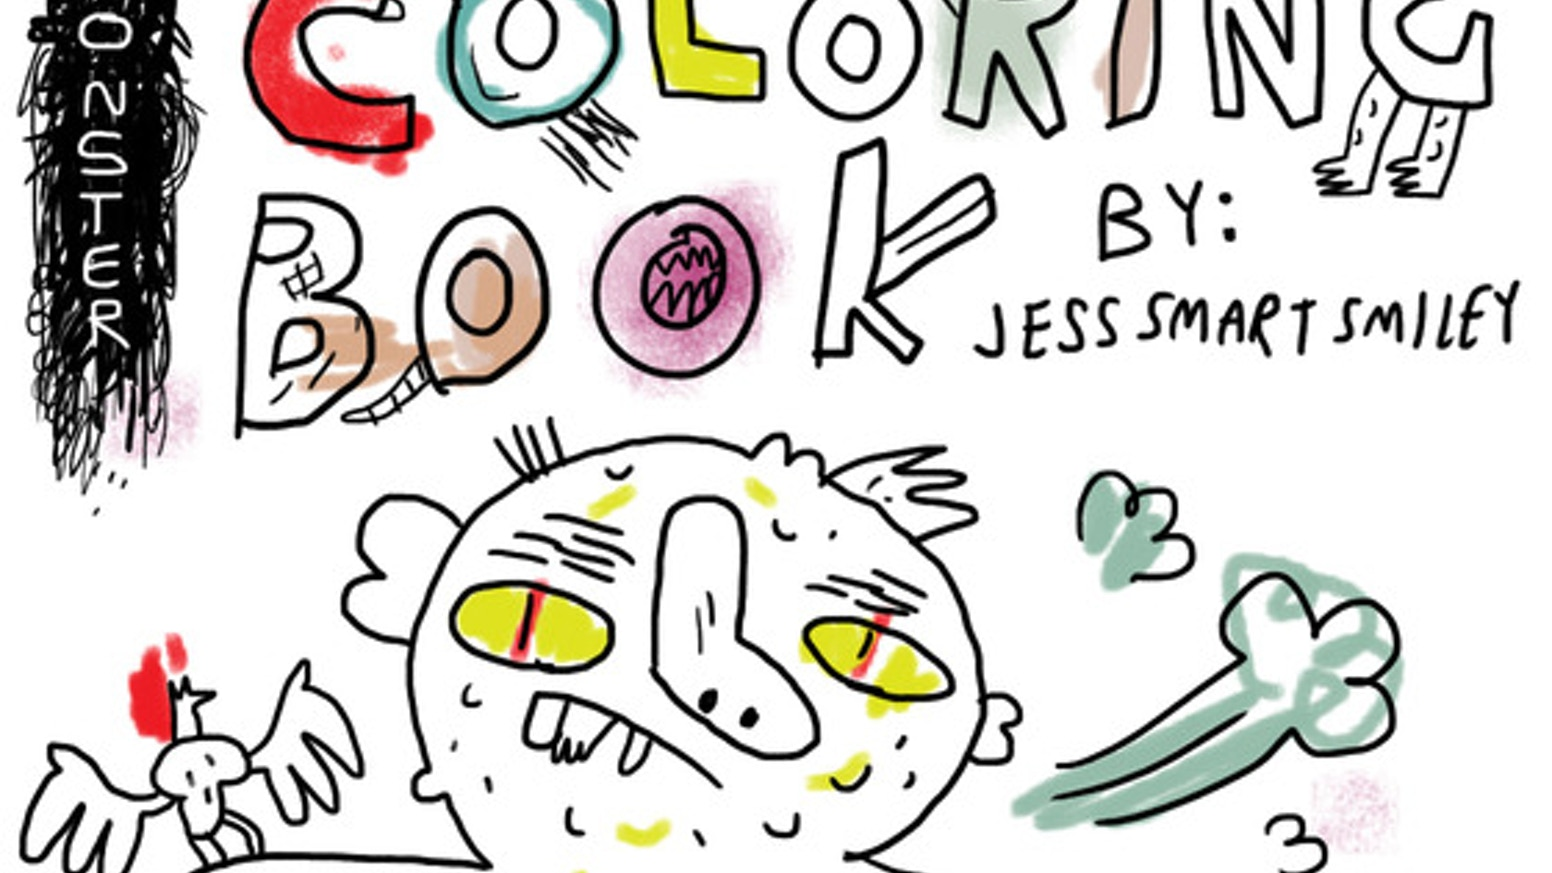 MONSTER COLORING BOOK* by jess smart smiley — Kickstarter